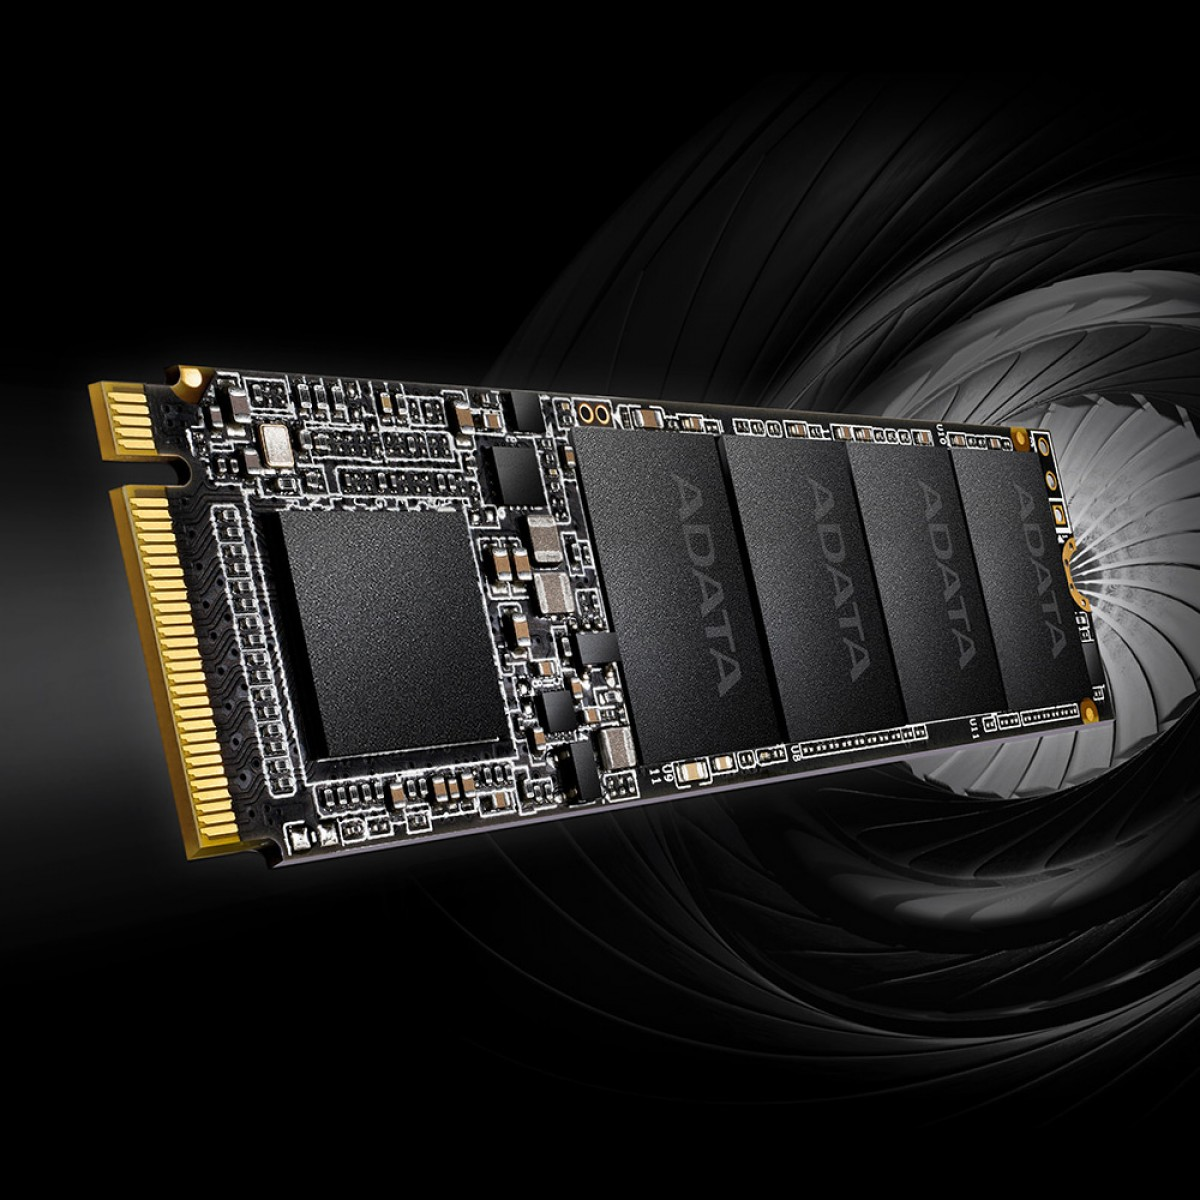 SSD Adata XPG SX6000 Lite 128GB, M.2 2280, Leitura 1800MBs e Gravação 1200MBs, ASX6000LNP-128GT-C